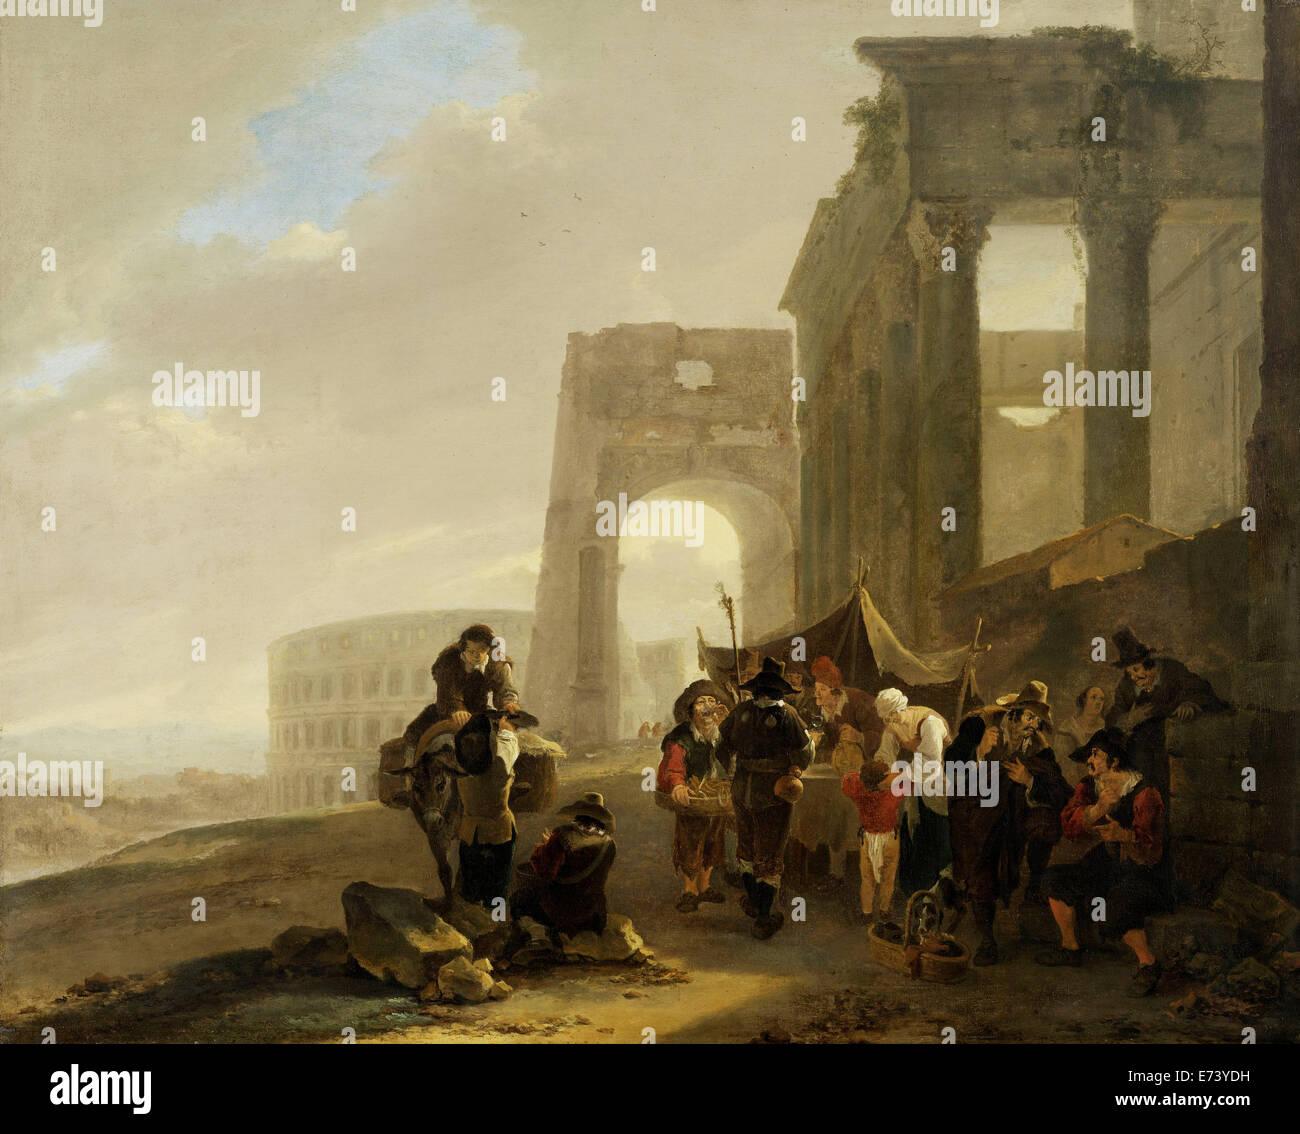 Escena Folk entre ruinas romanas - por Jan Both, 1640 - 1652 Foto de stock